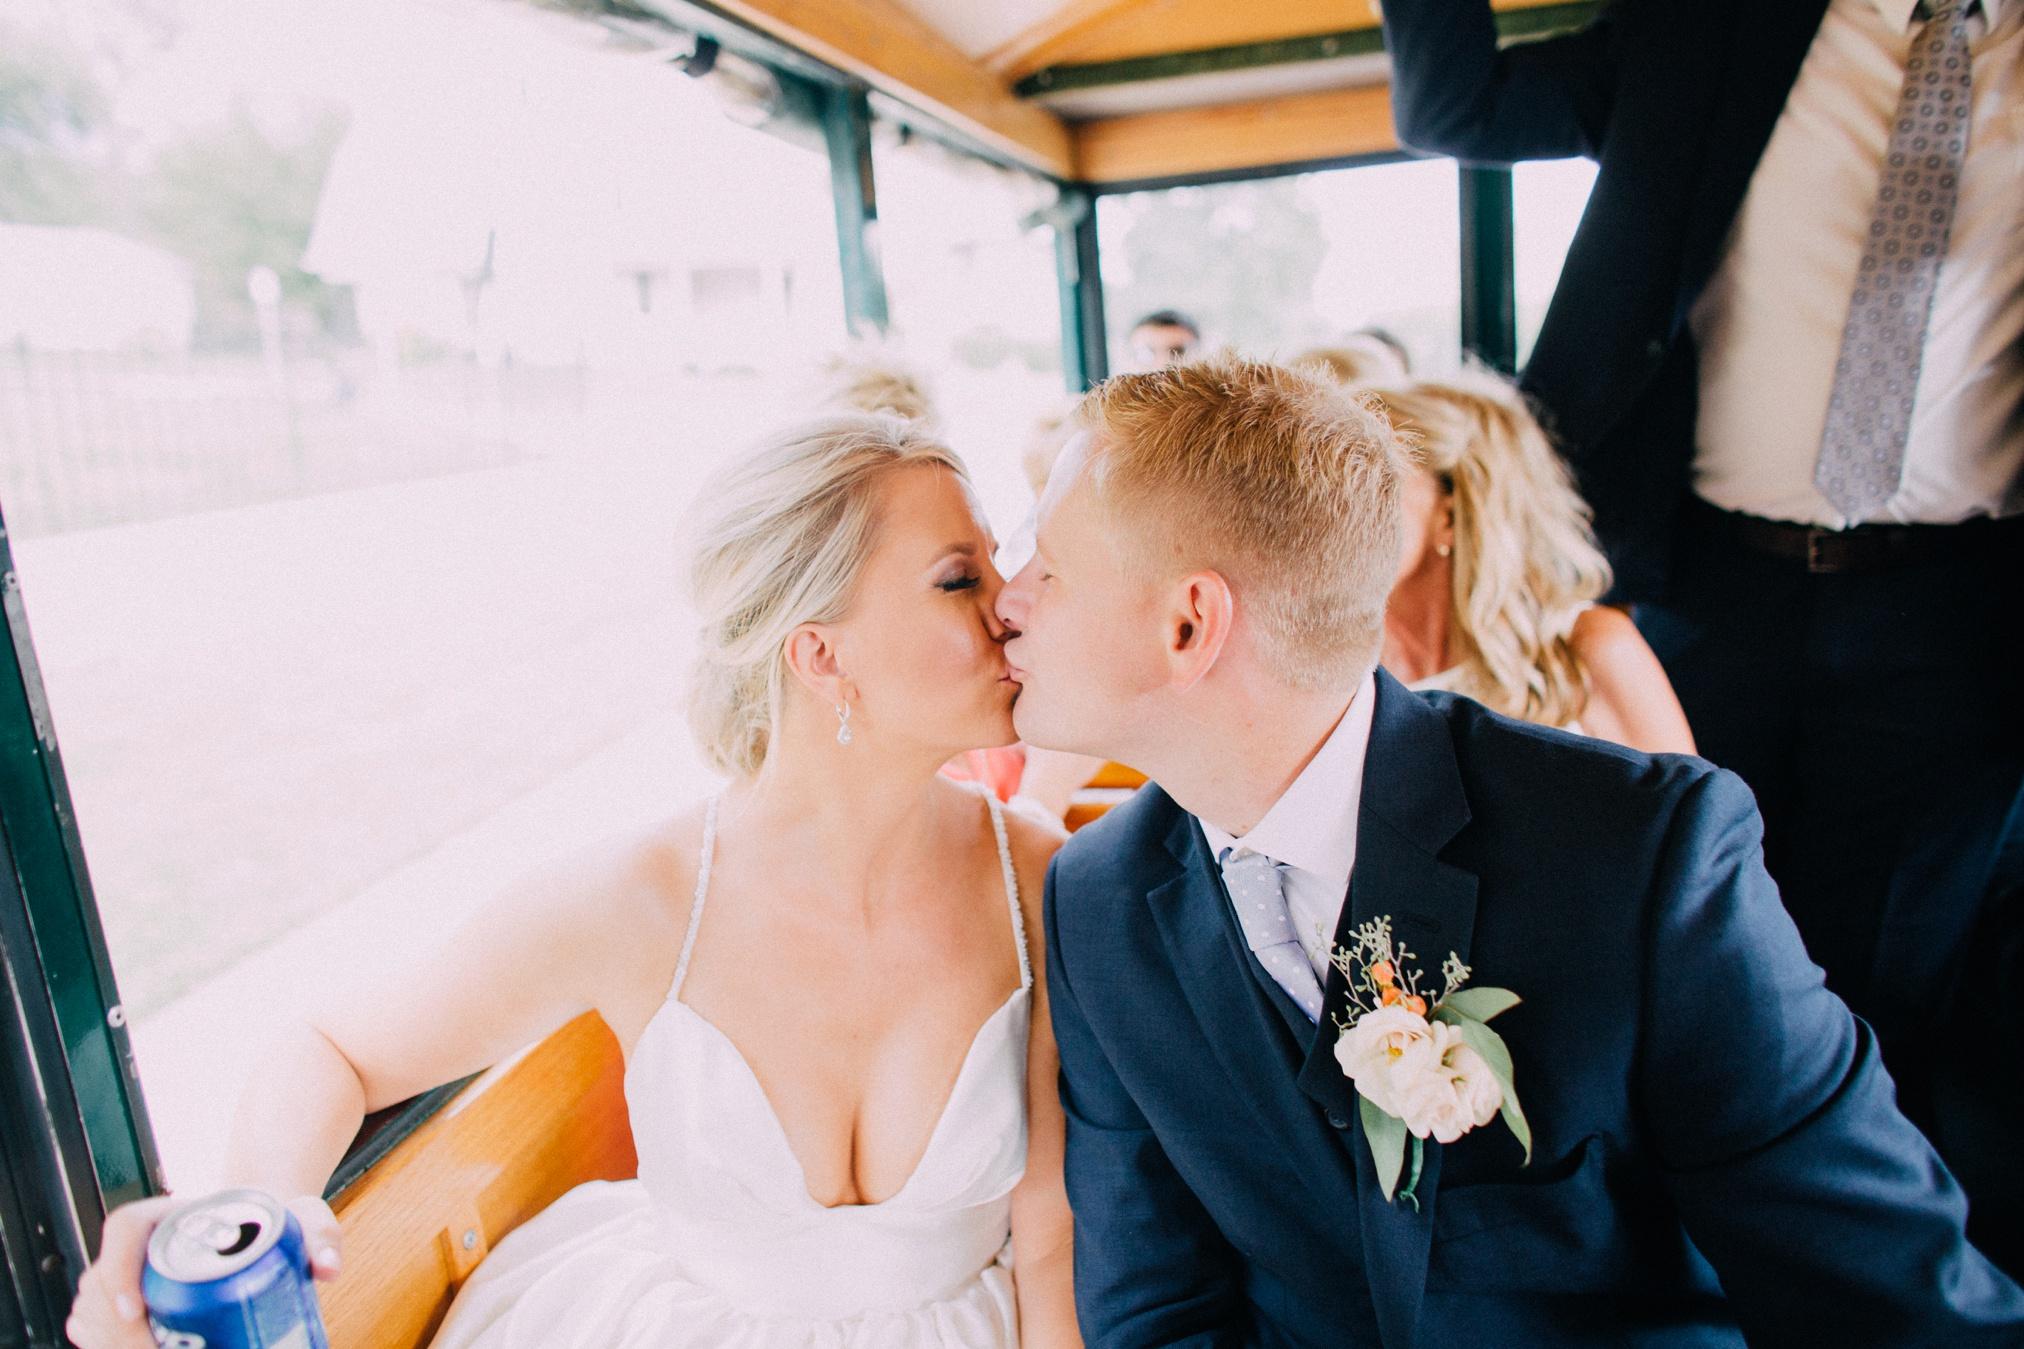 brenna+michael_wedding-521.jpg